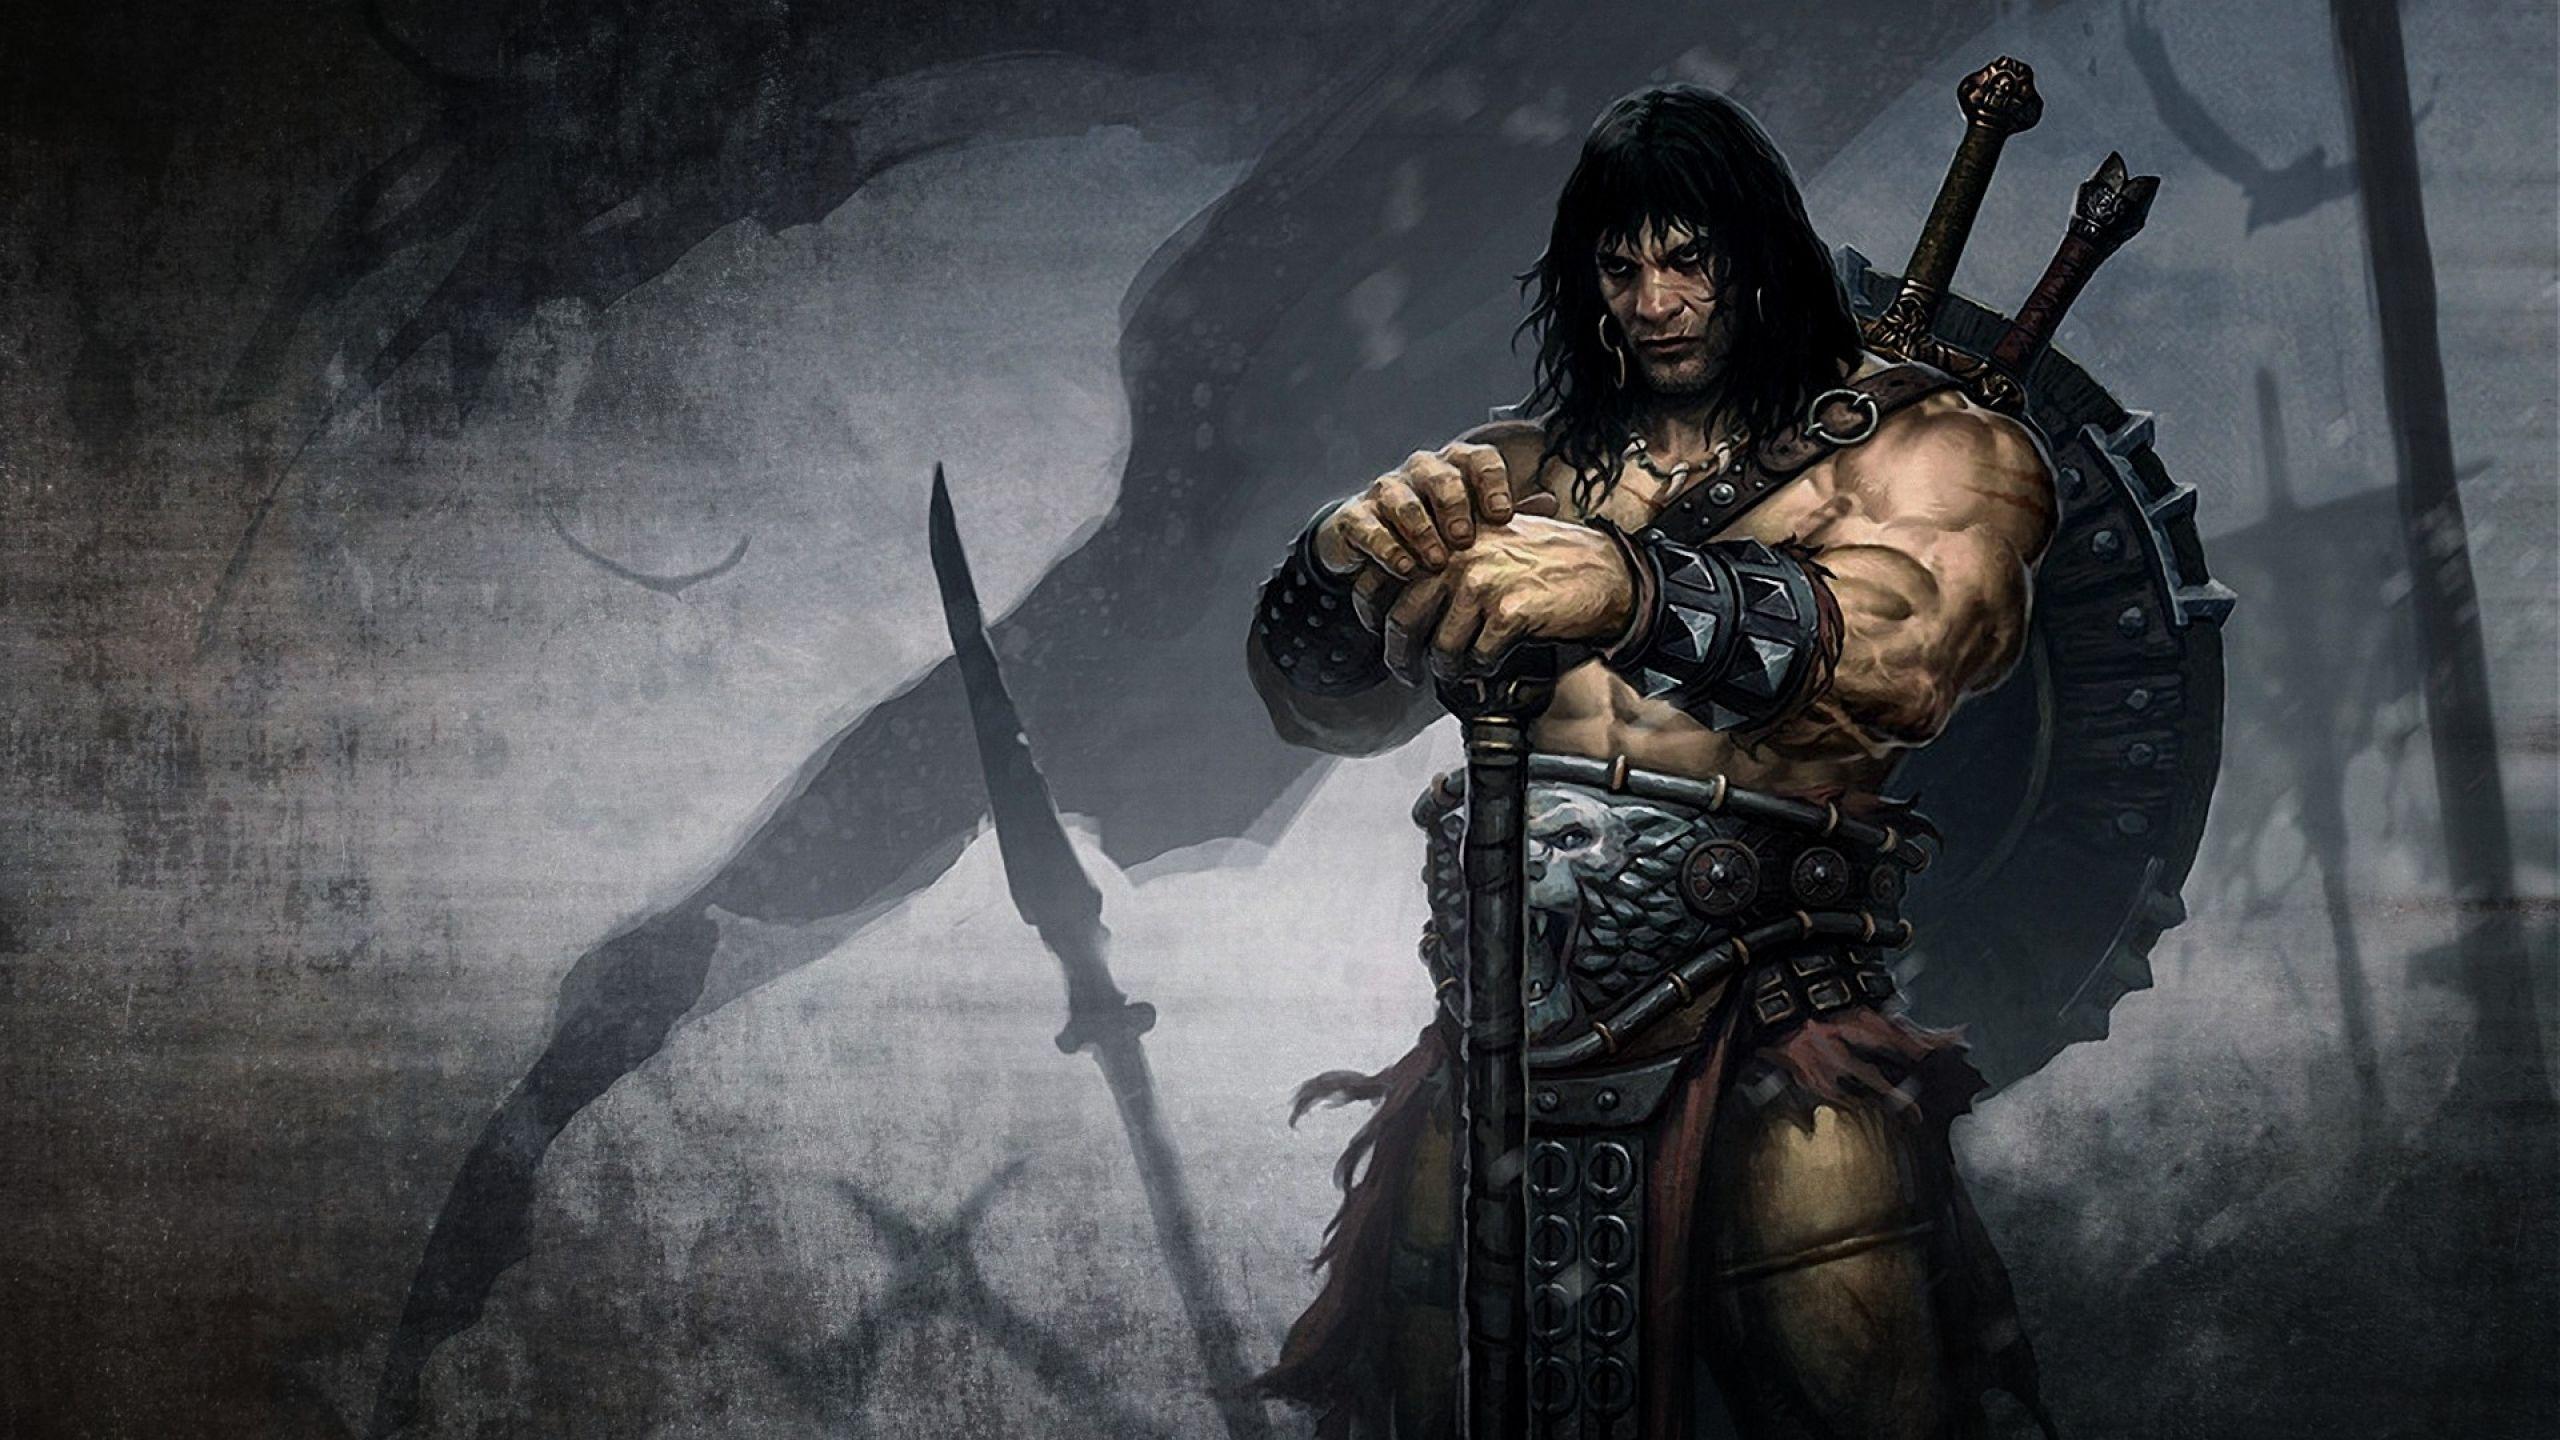 москве похолодало, картинки на рабочий стол воин с мечом сборно-разборная, предназначена